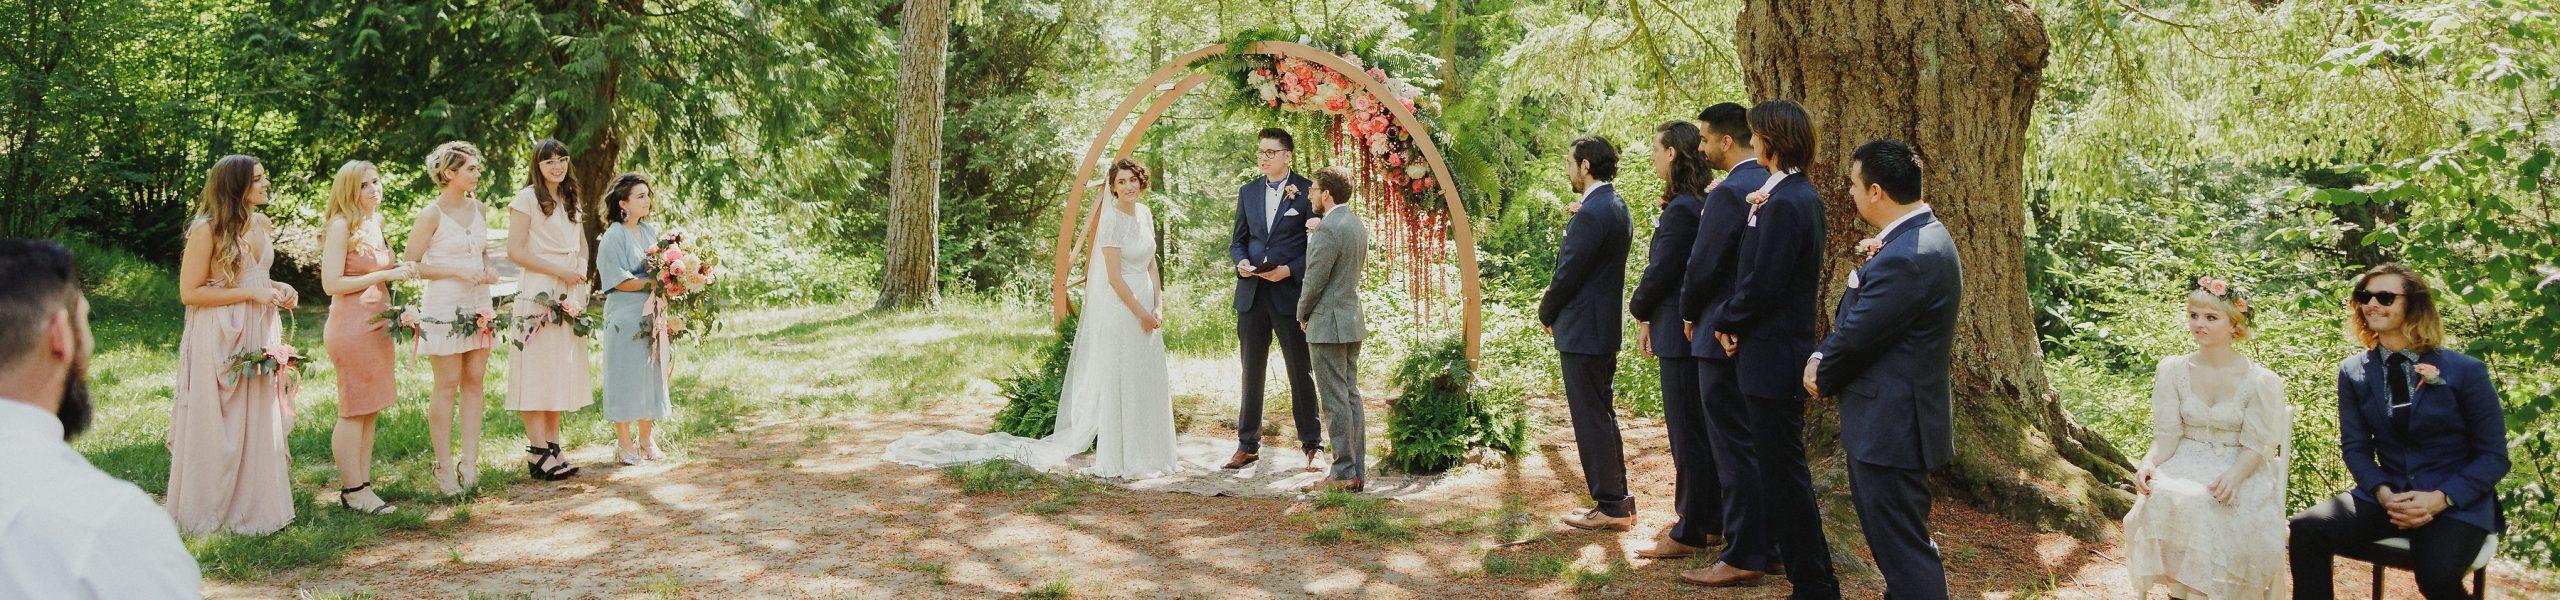 Wedding Meadow